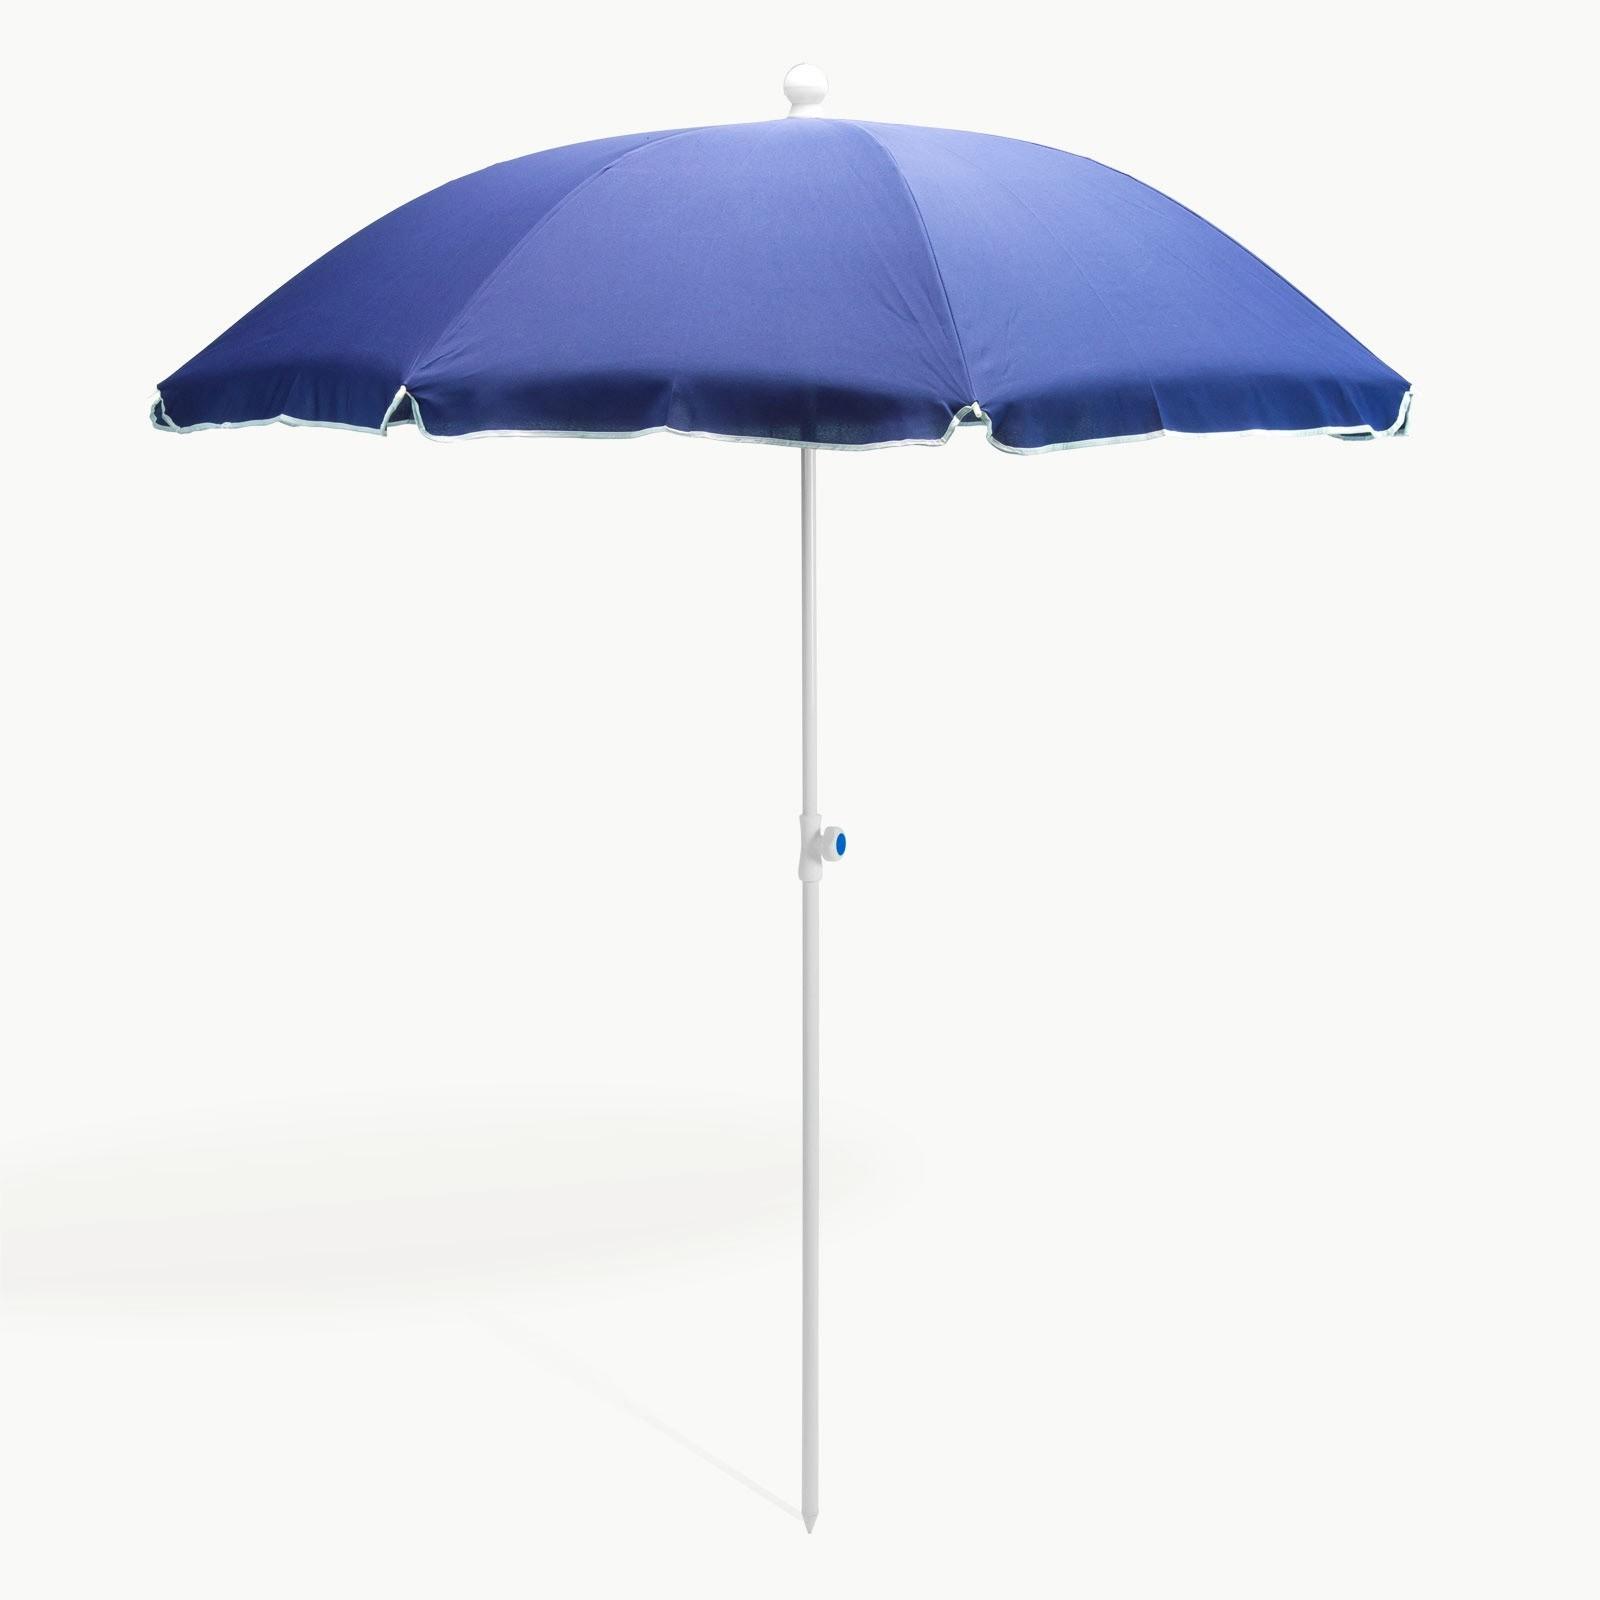 Dema Strandschirm blau 180 cm UV30 Sonnenschirm Gartenschirm Schirm 41273